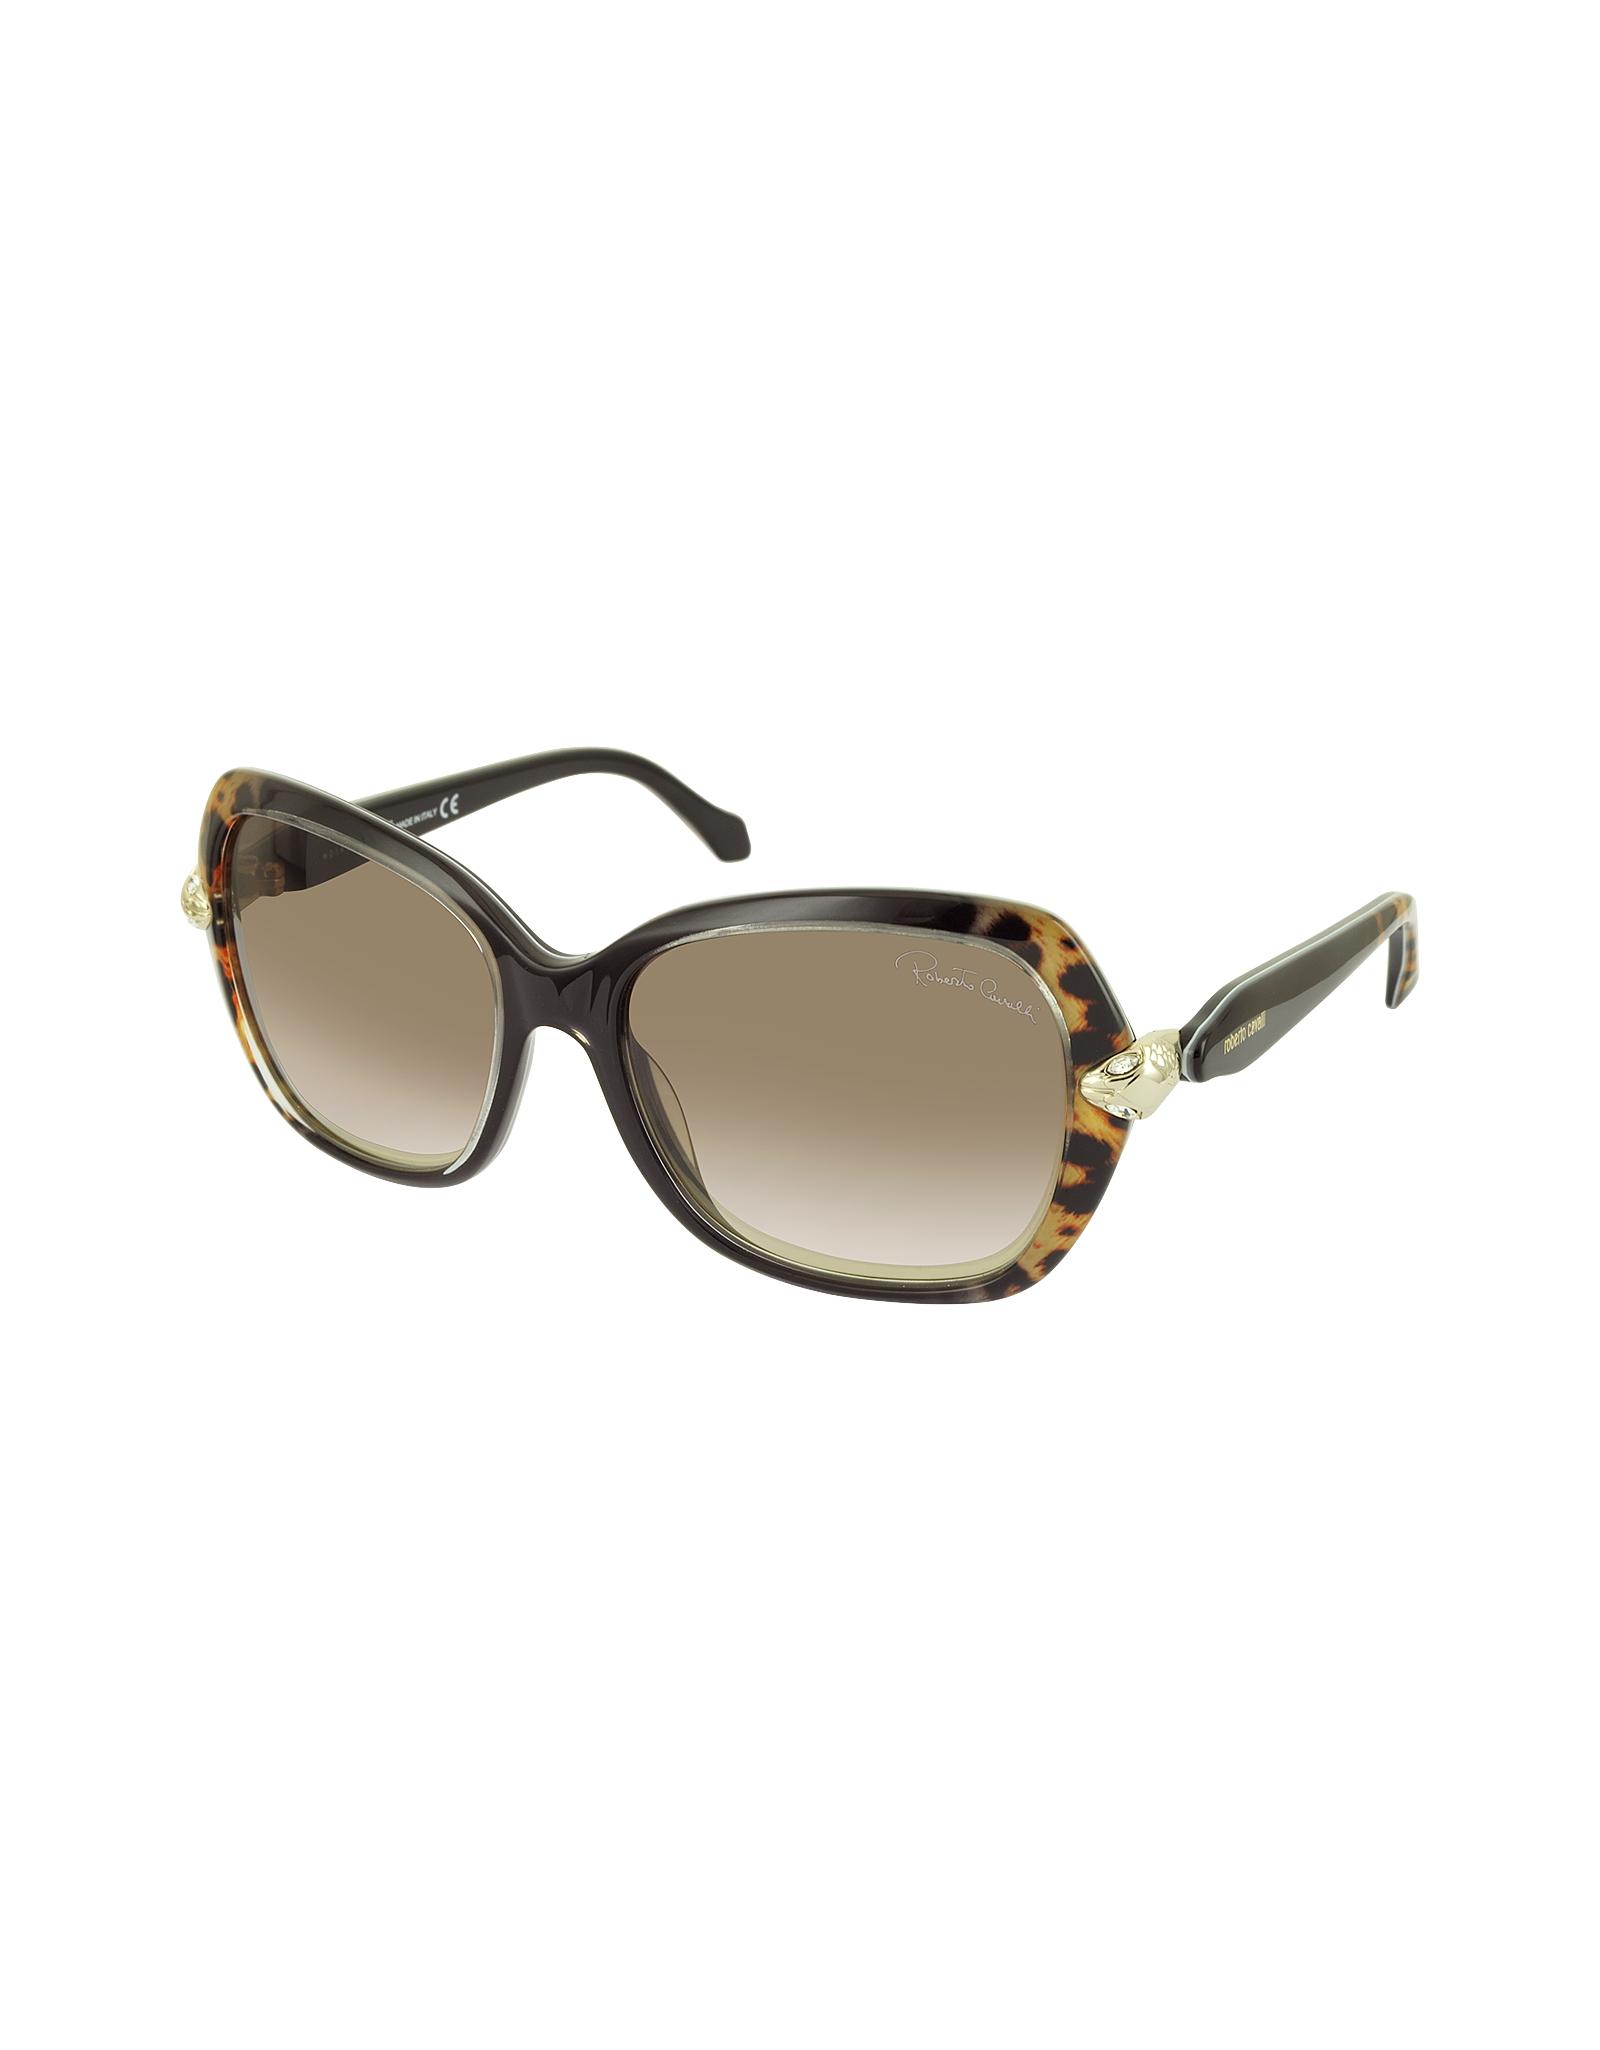 Roberto Cavalli Woman Square-frame Acetate Sunglasses Black Size Roberto Cavalli F4pTKZRHwA